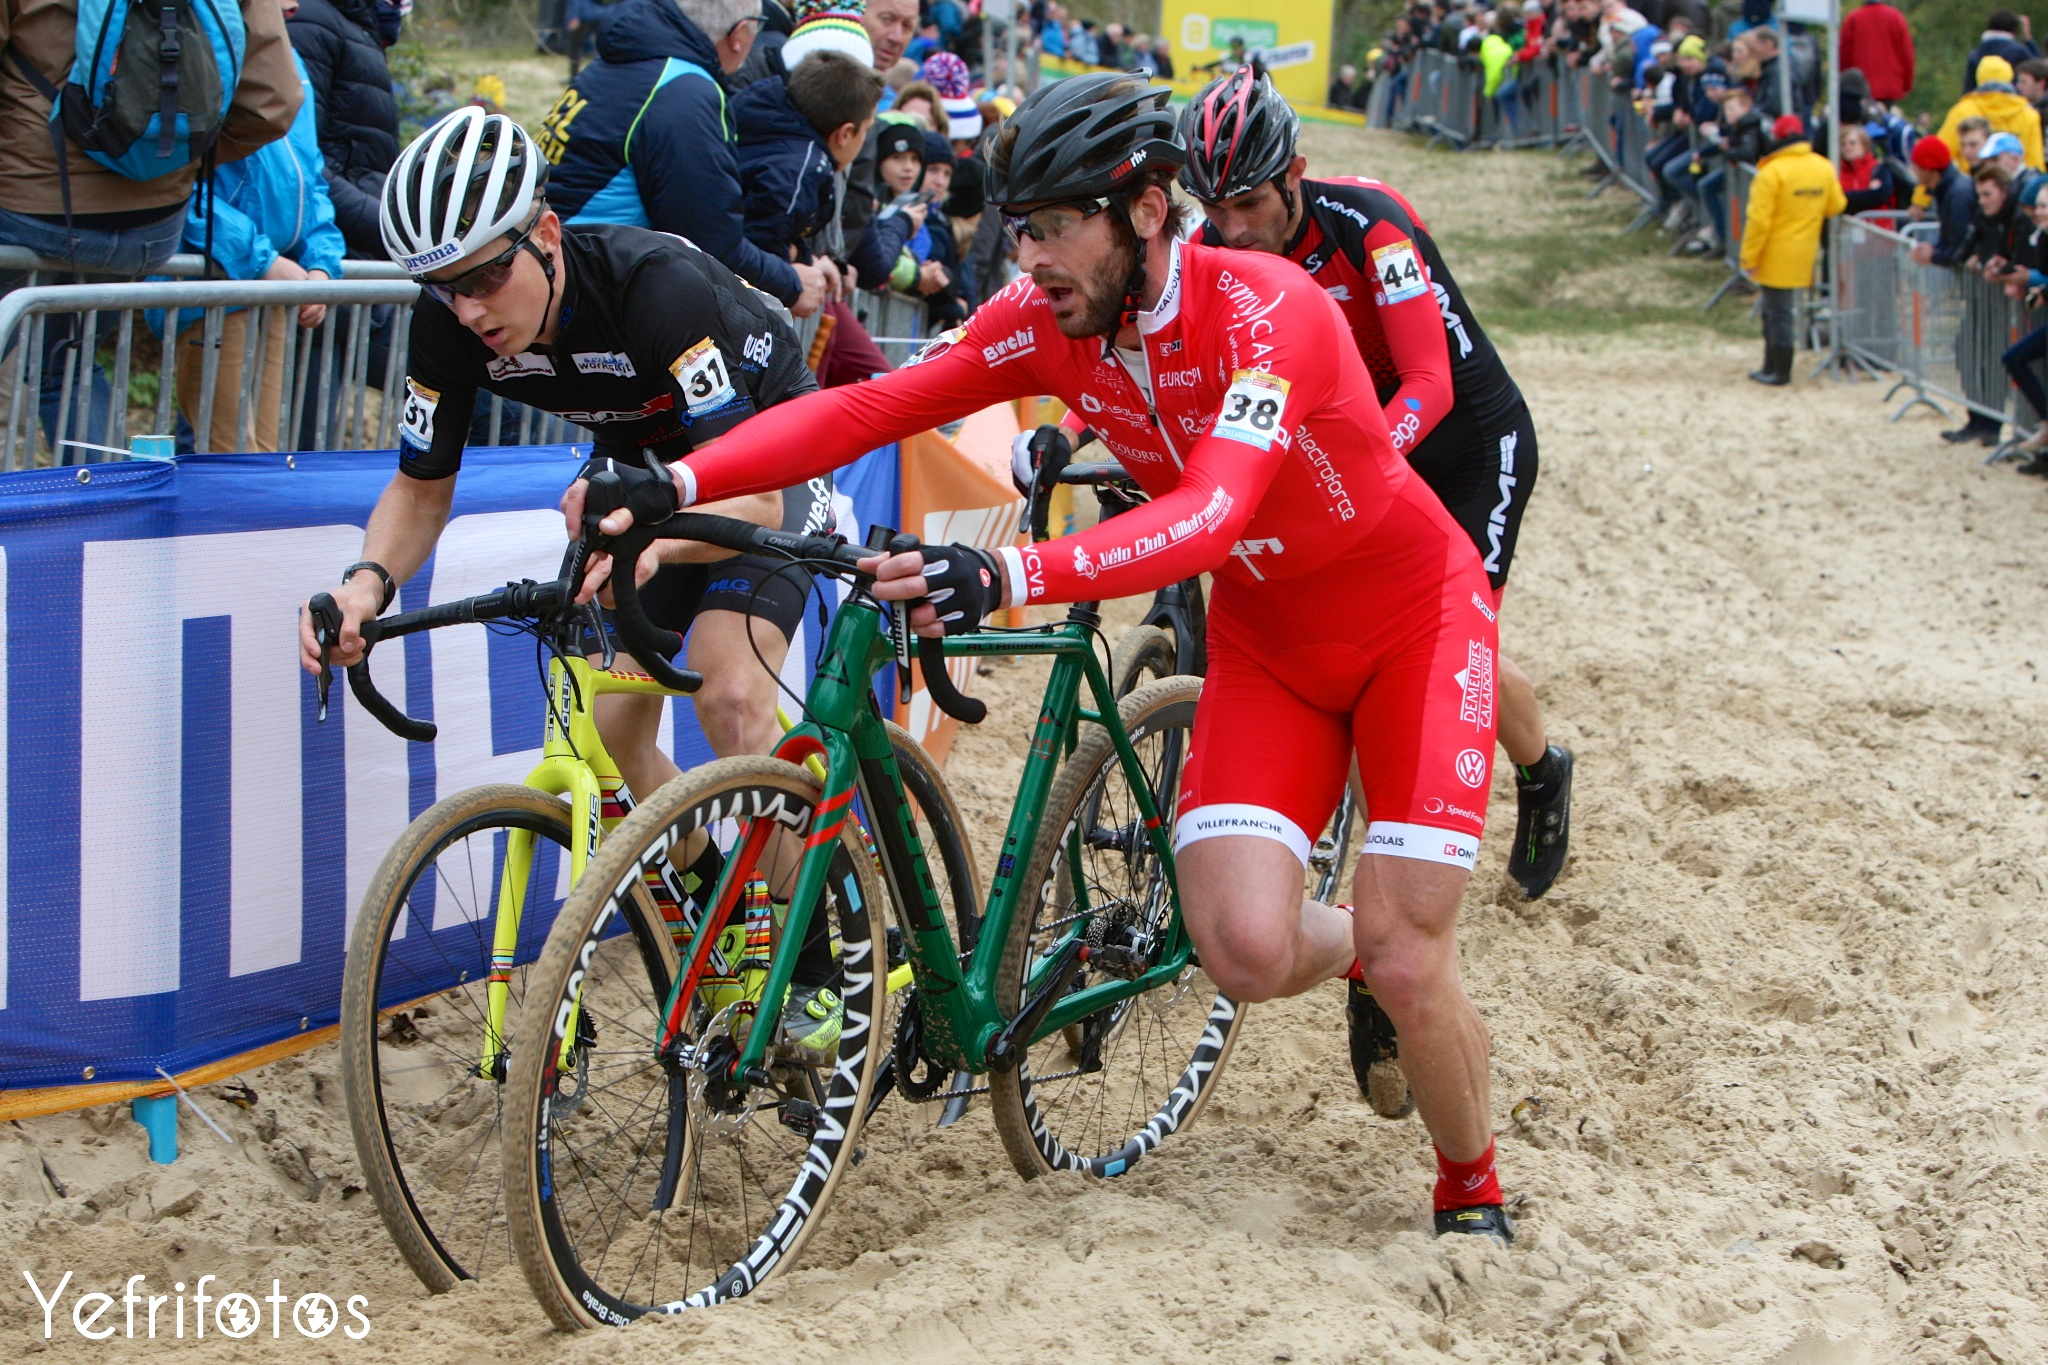 Koksijde - UCI Cyclocross World Cup - Alois Falenta